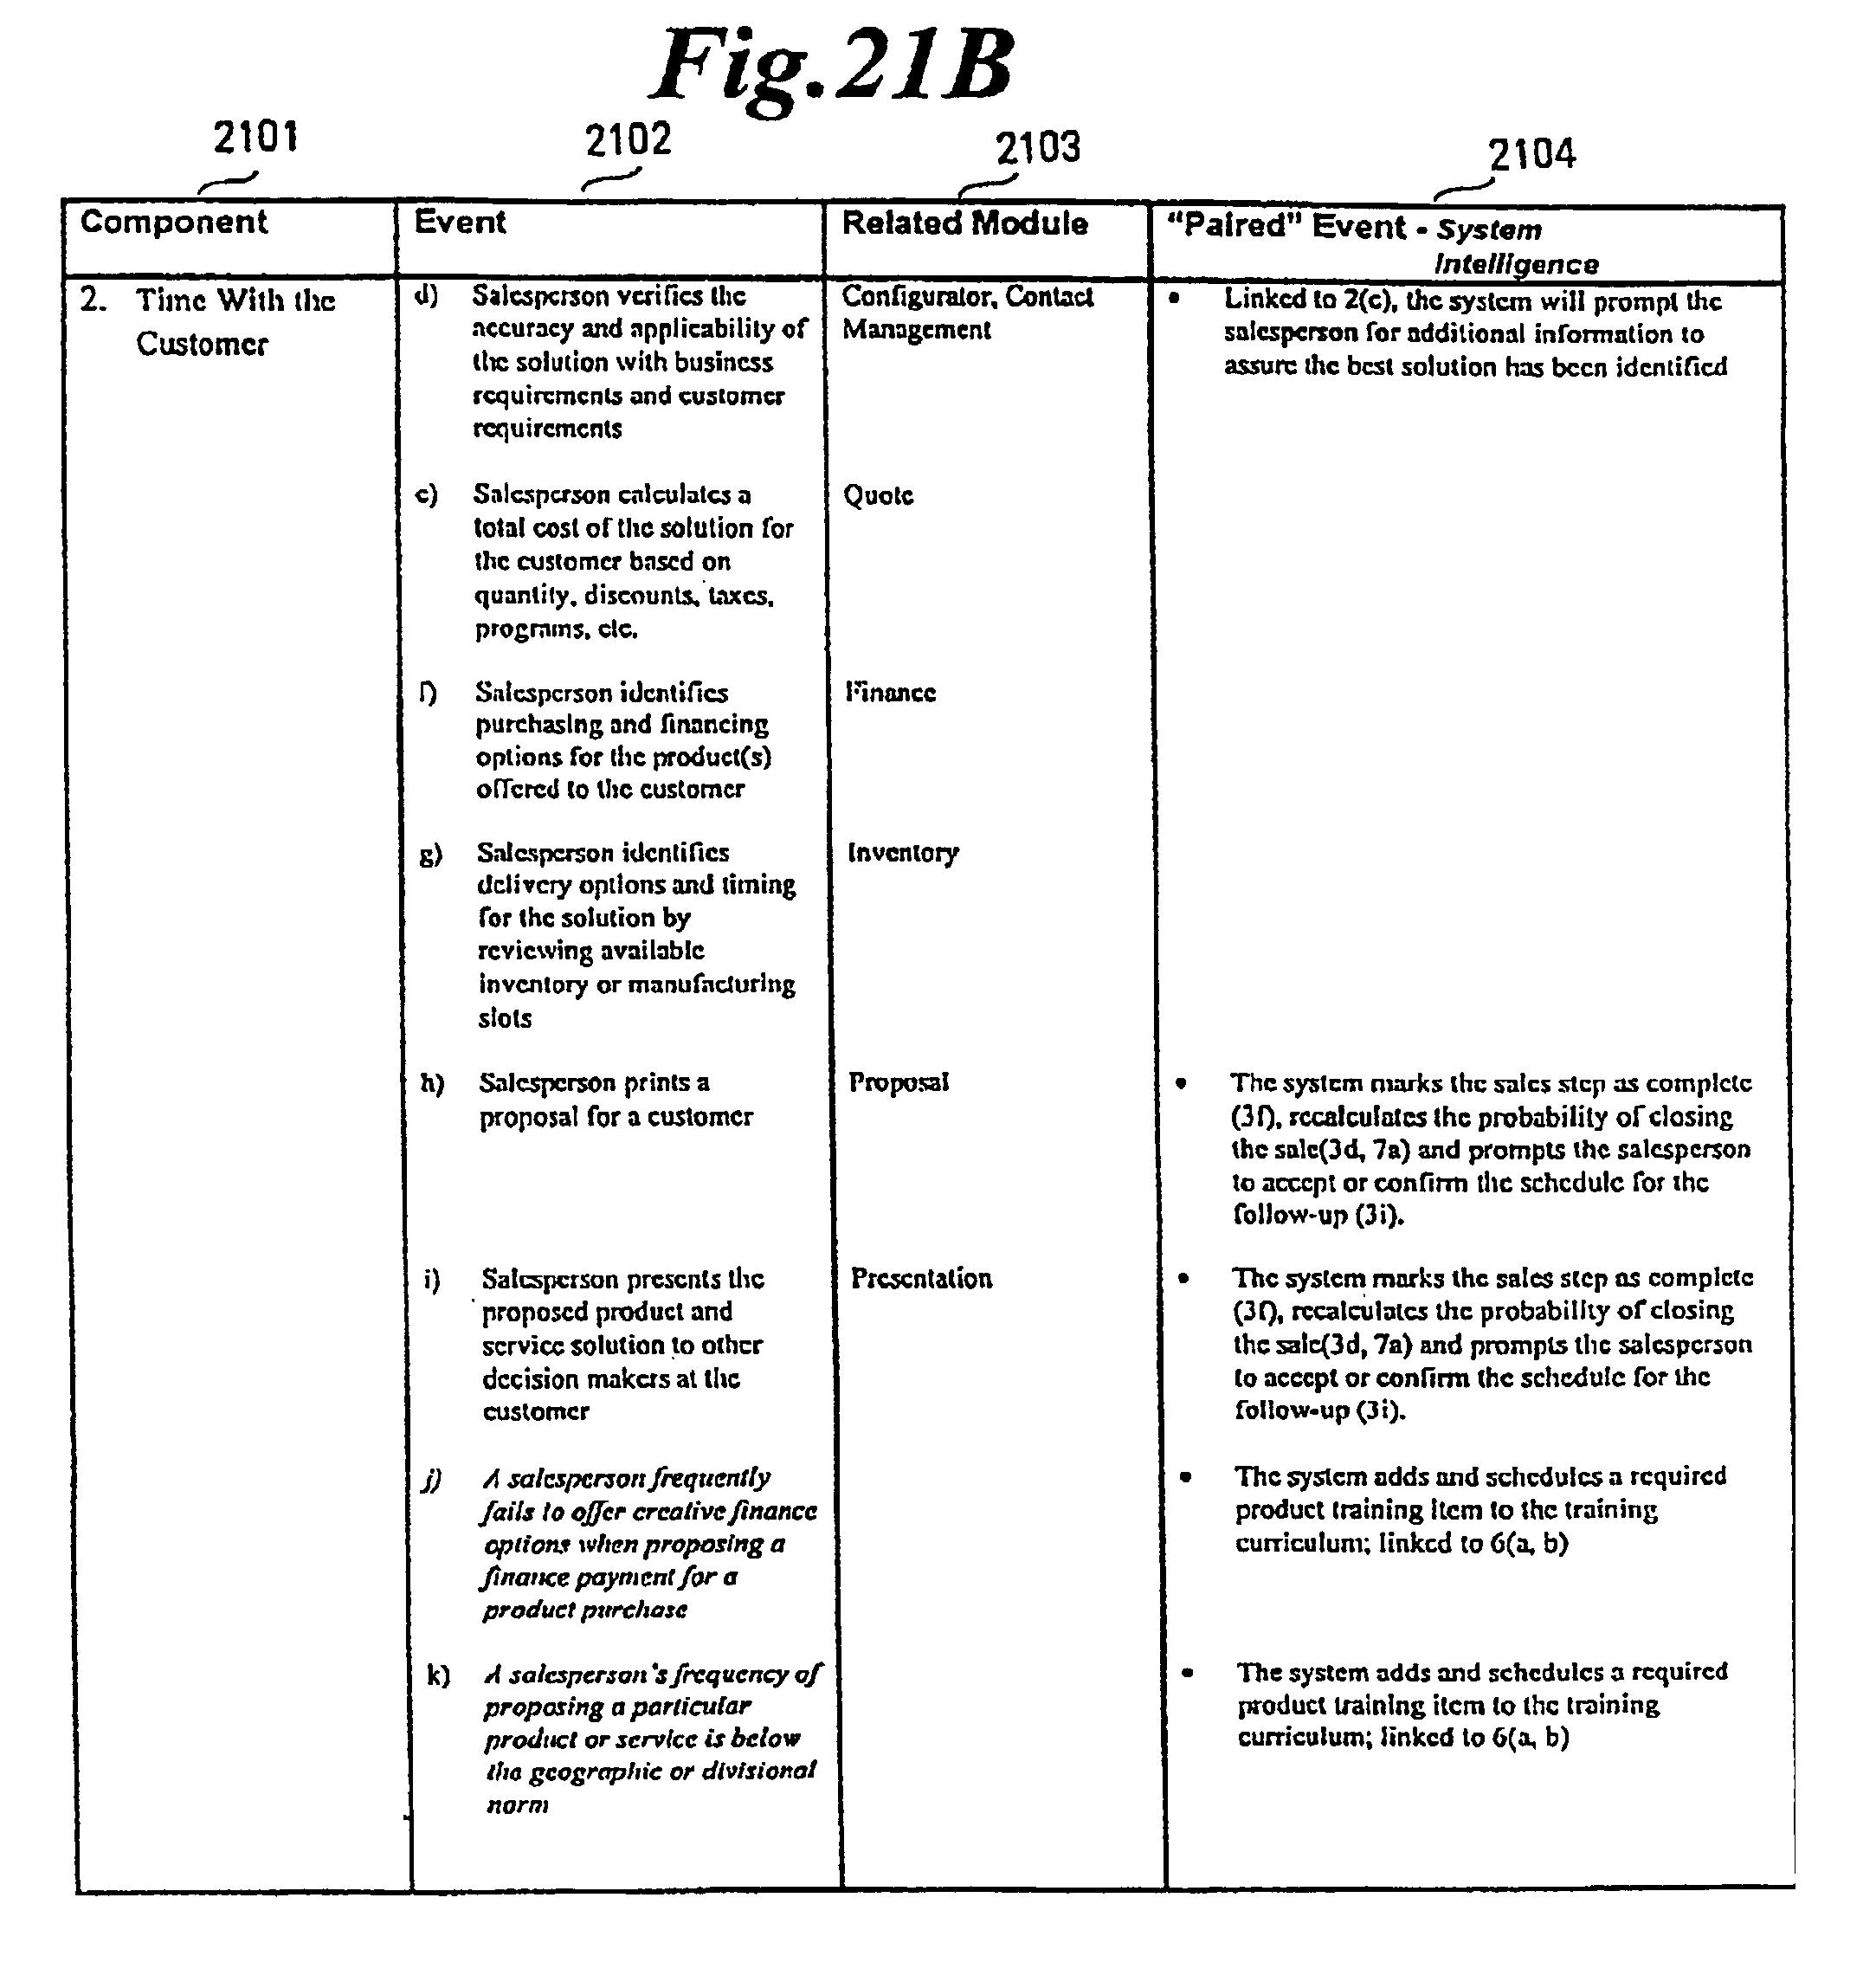 Patent US 7,941,341 B2